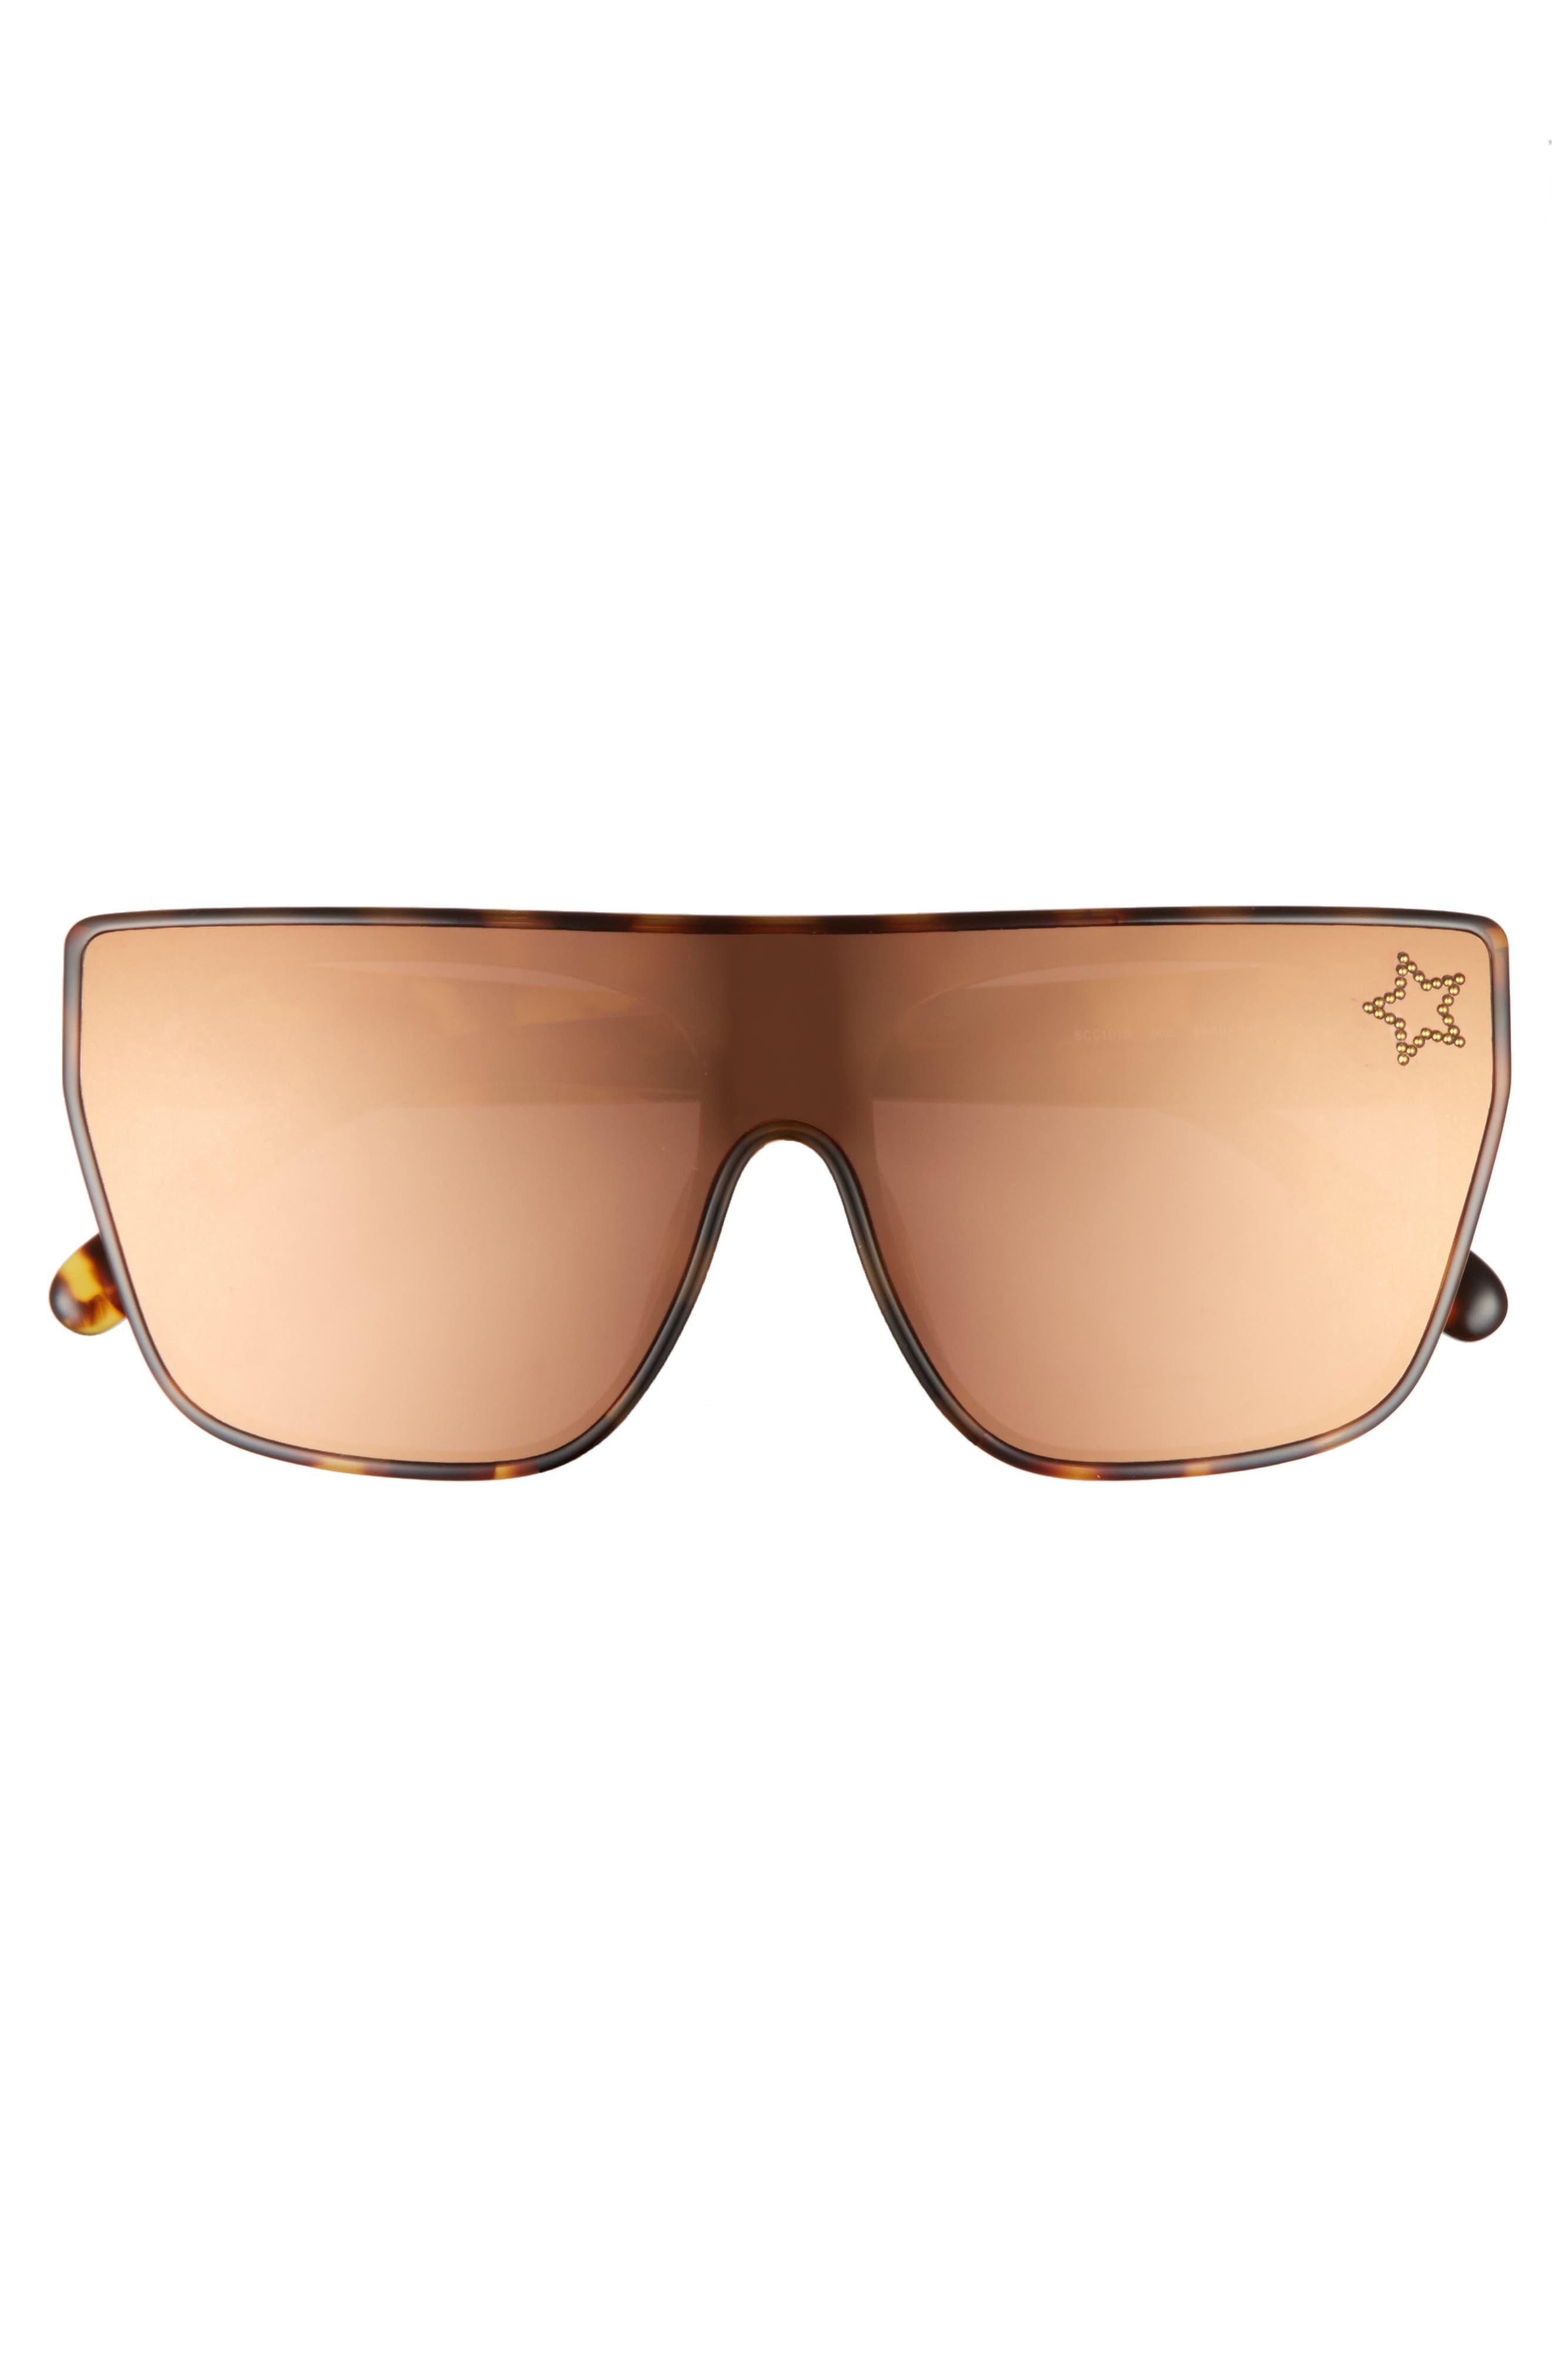 99mm Flat Top Sunglasses,                             Alternate thumbnail 3, color,                             Blonde Avana